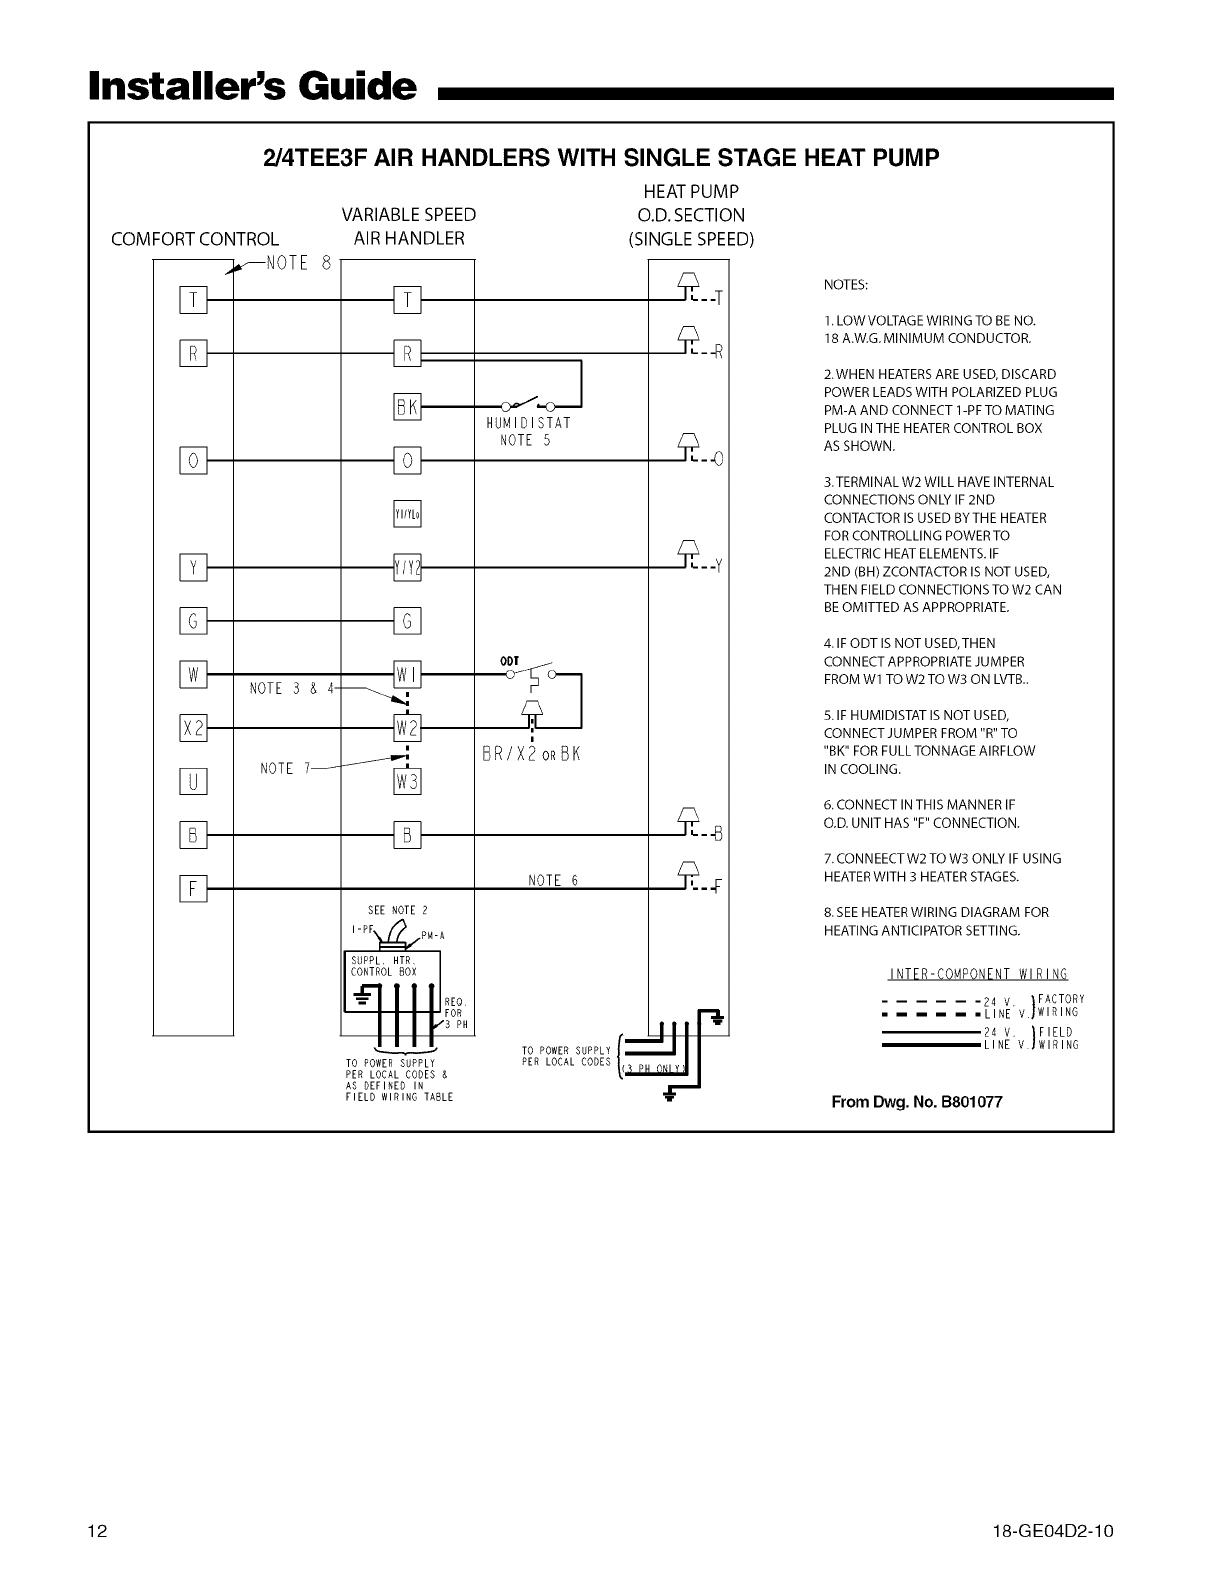 Trane Air Handler Indoor Blowerevap Manual L0905018 Low Voltage Wiring Guide Installers